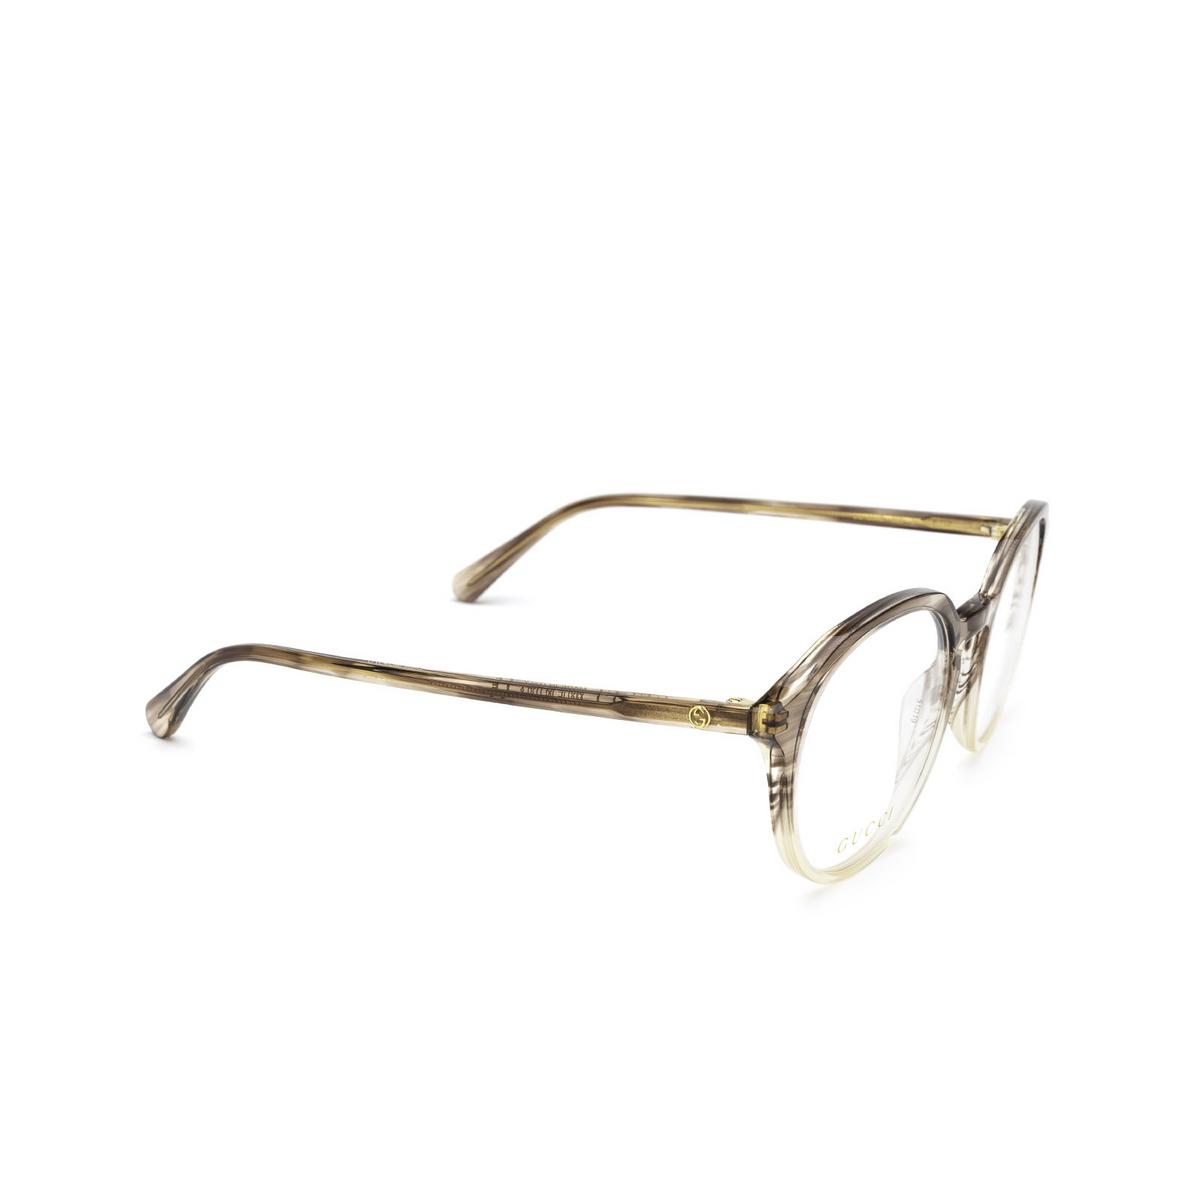 Gucci® Round Eyeglasses: GG1004O color Grey Gradient 003 - three-quarters view.